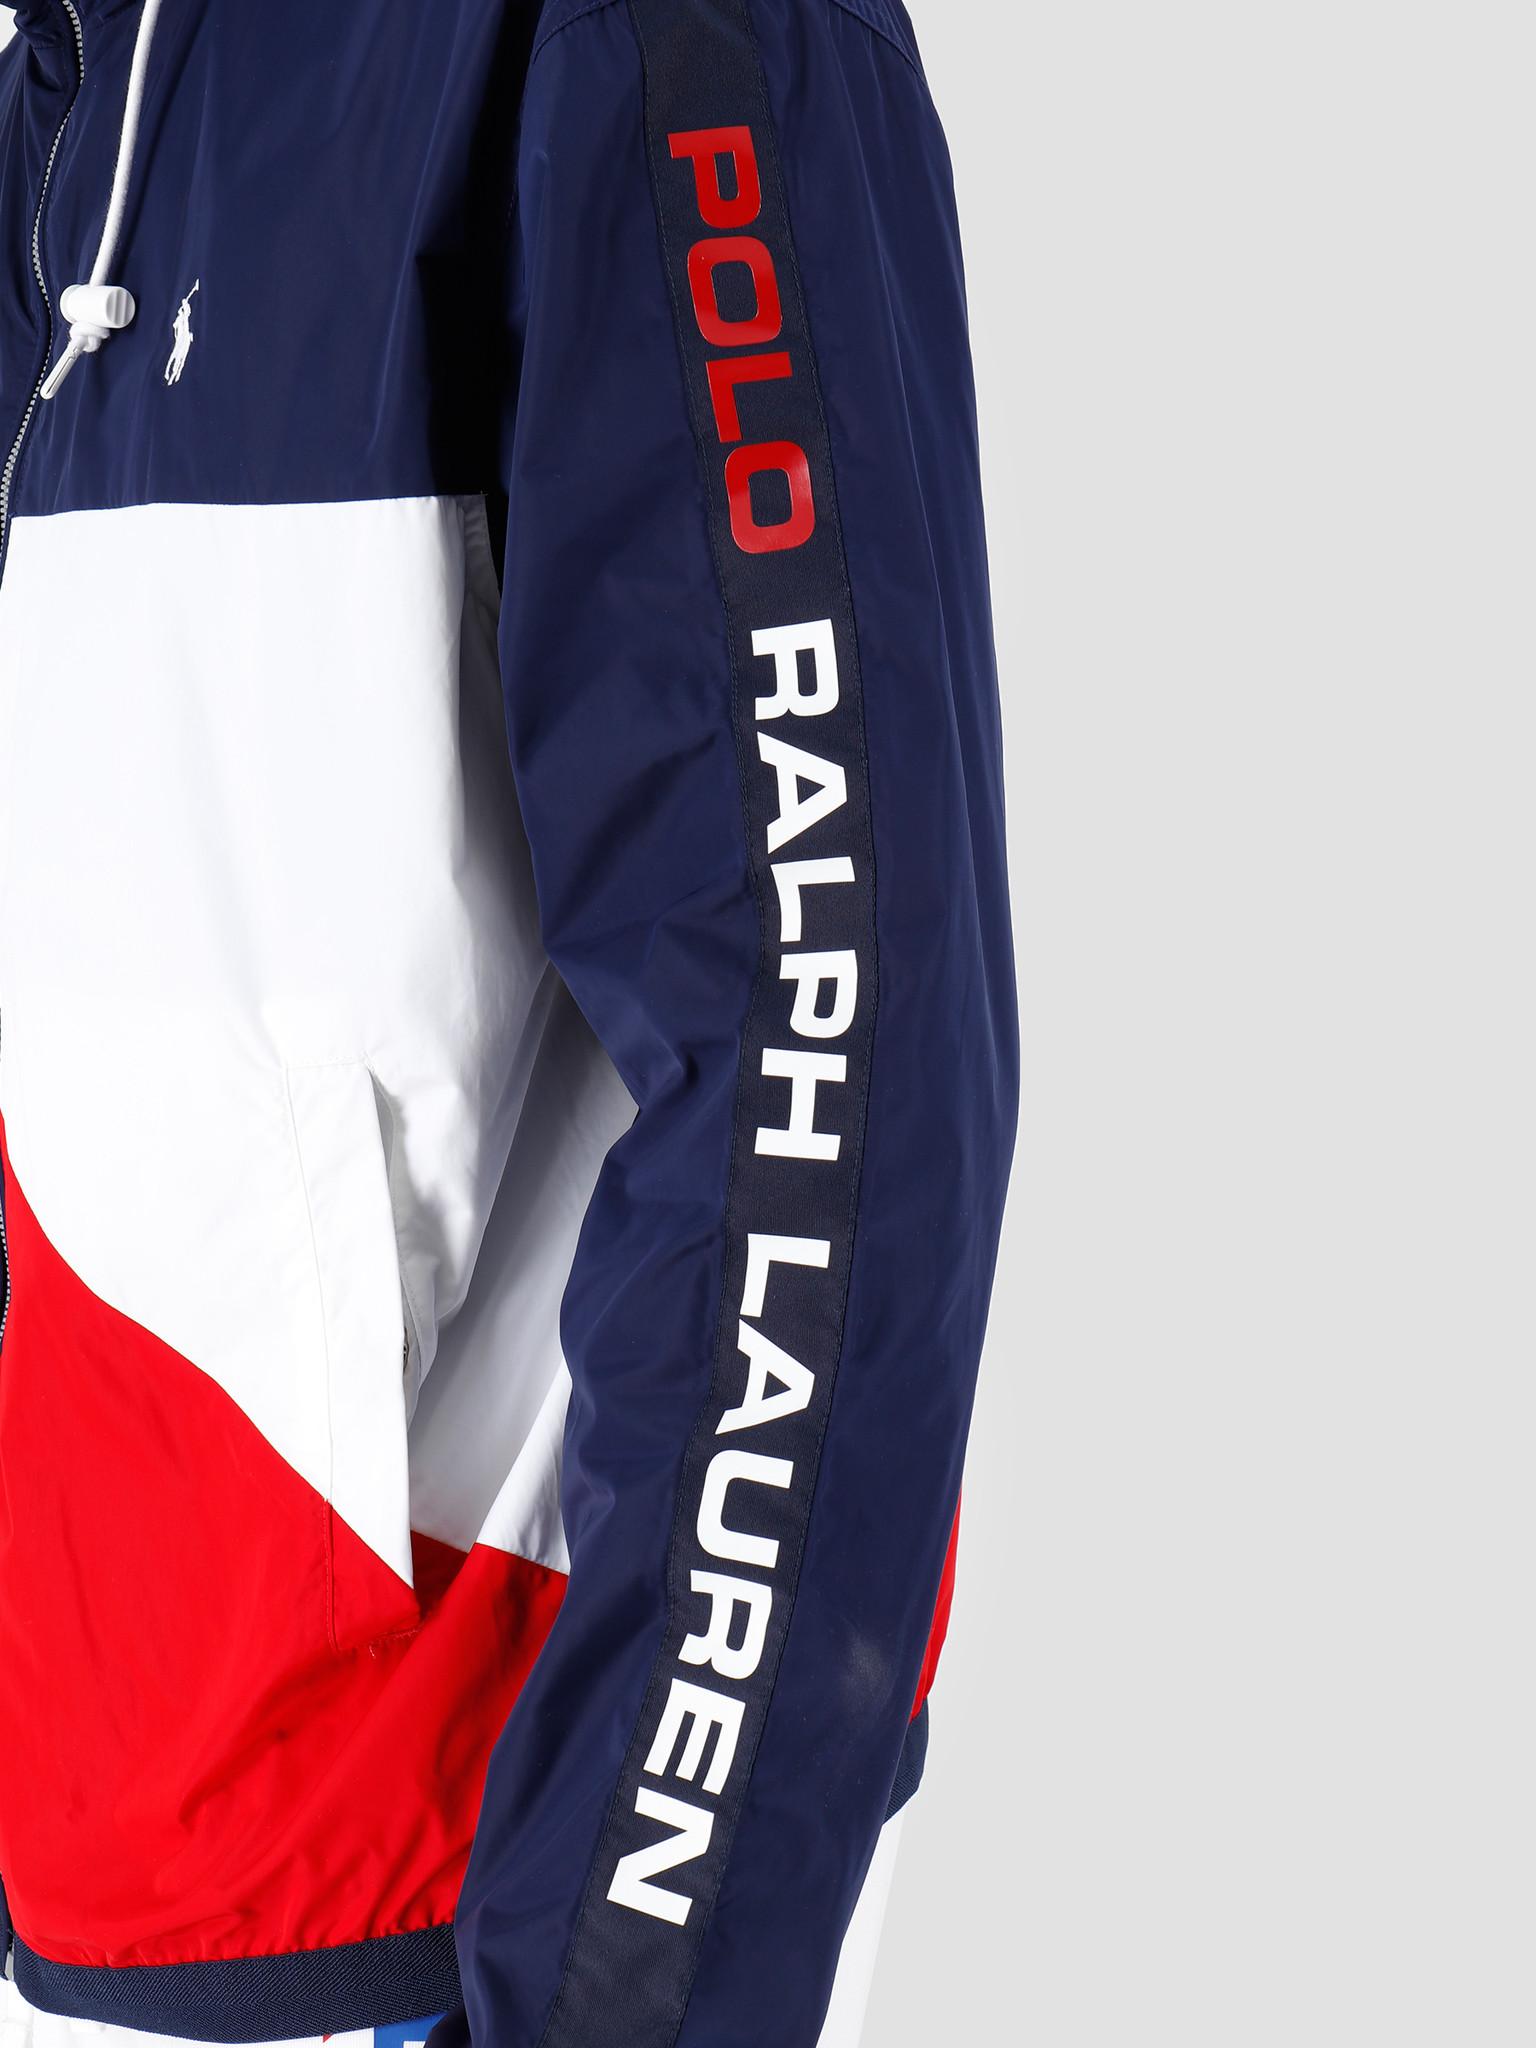 Polo Ralph Lauren Polo Ralph Lauren Pace Full Zip Jacket Multi 710745950001